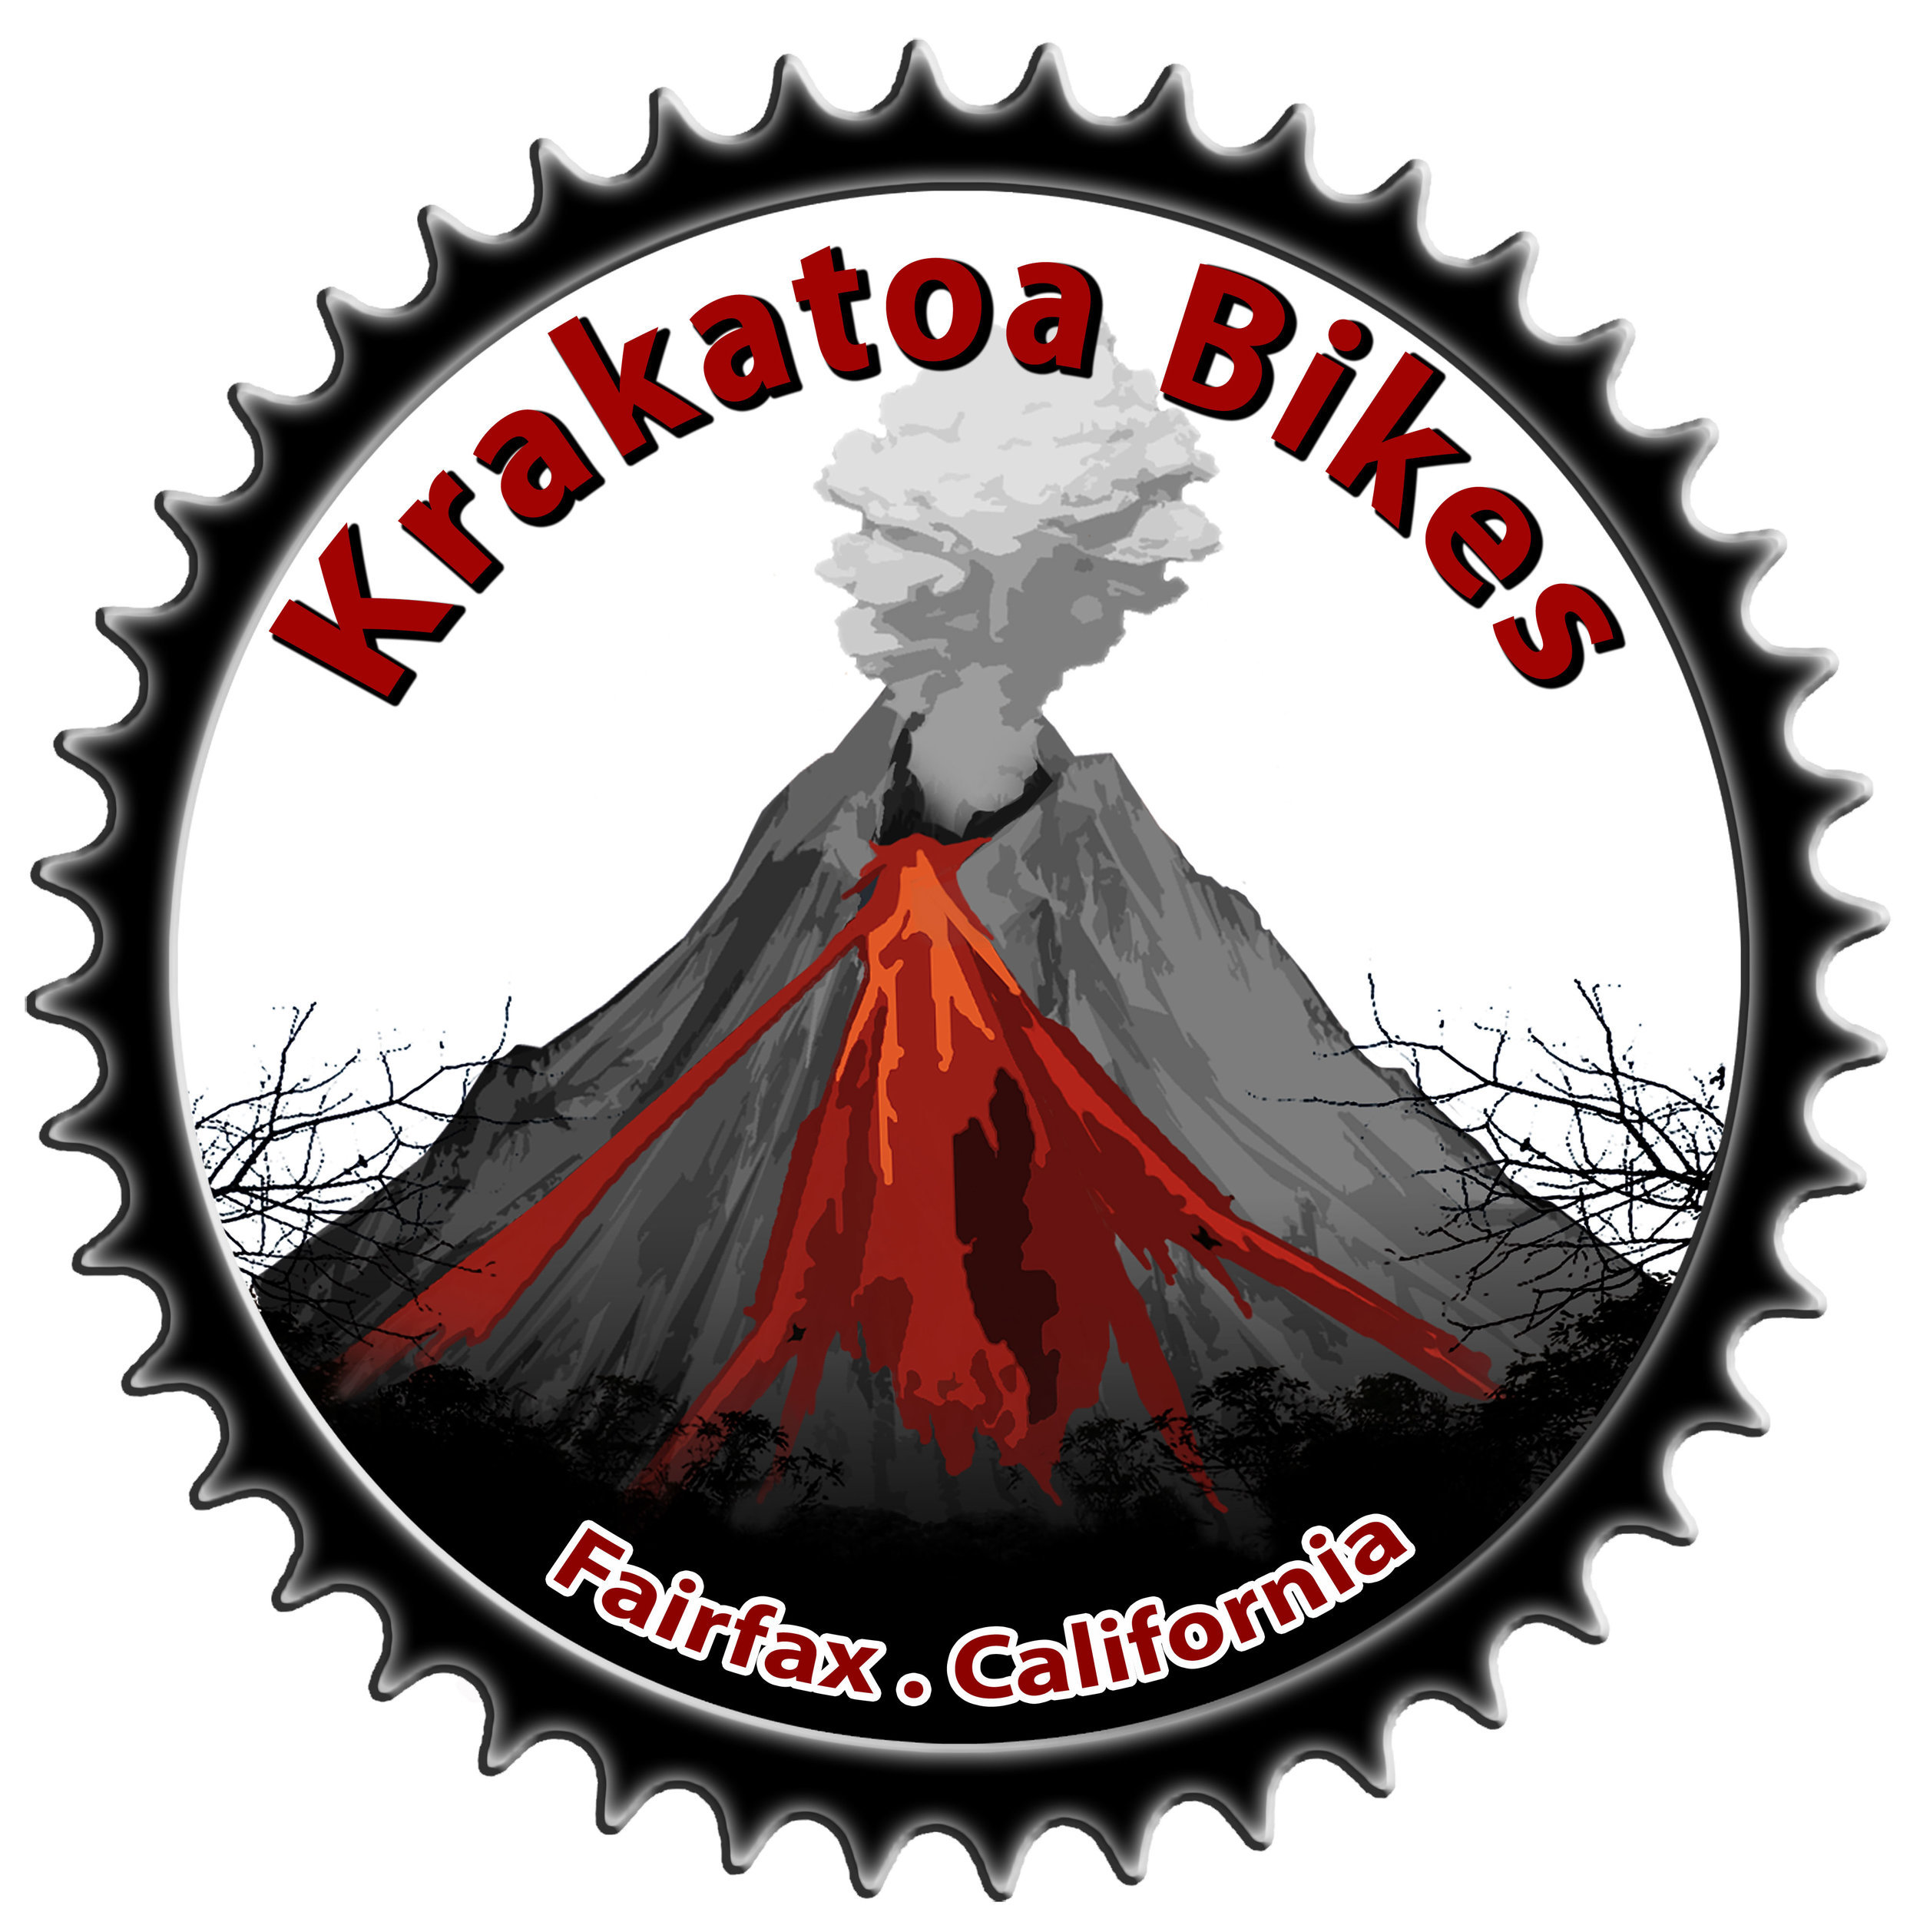 Krakatoa_logo_gear_largeResolution3web(1).jpg